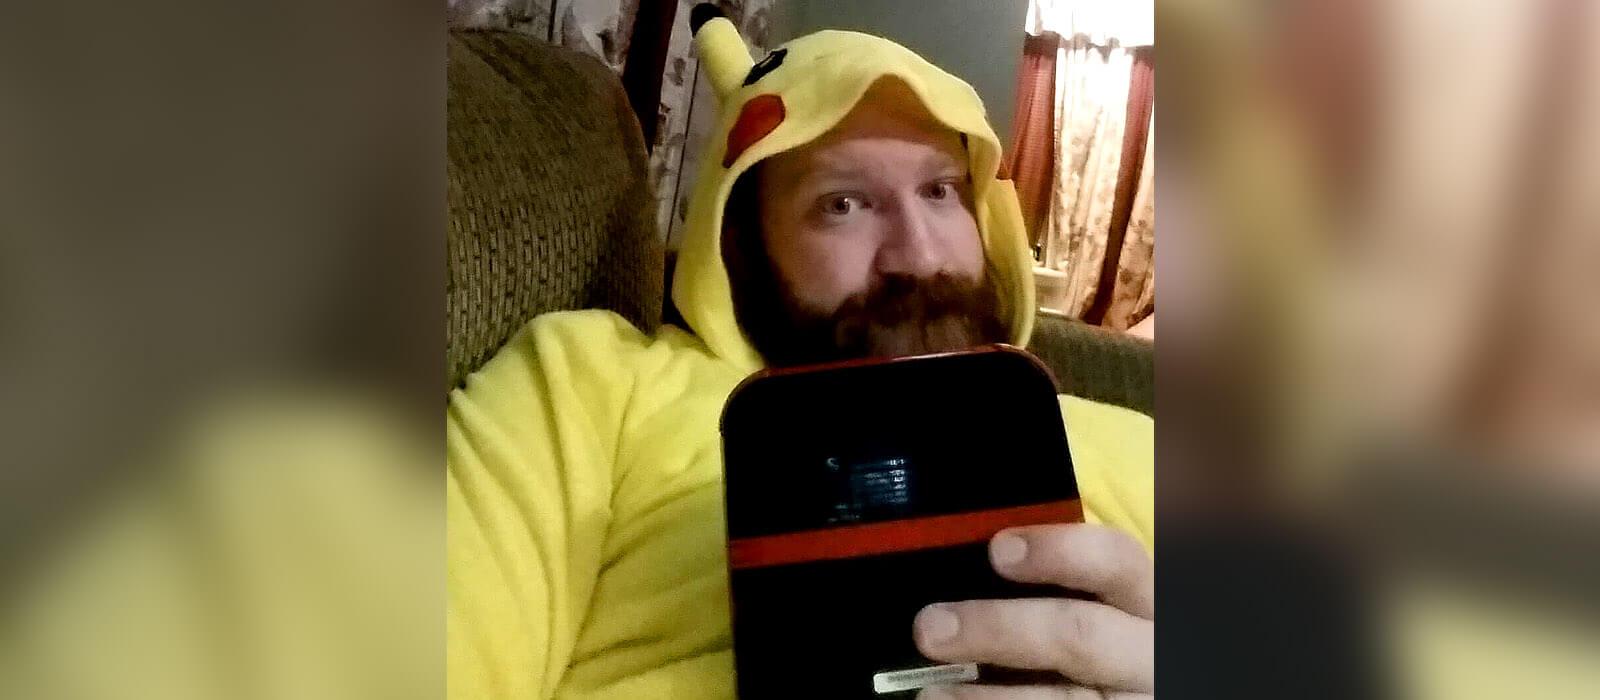 Me in my union suit (Kigurumi) playing Pokemon Moon.